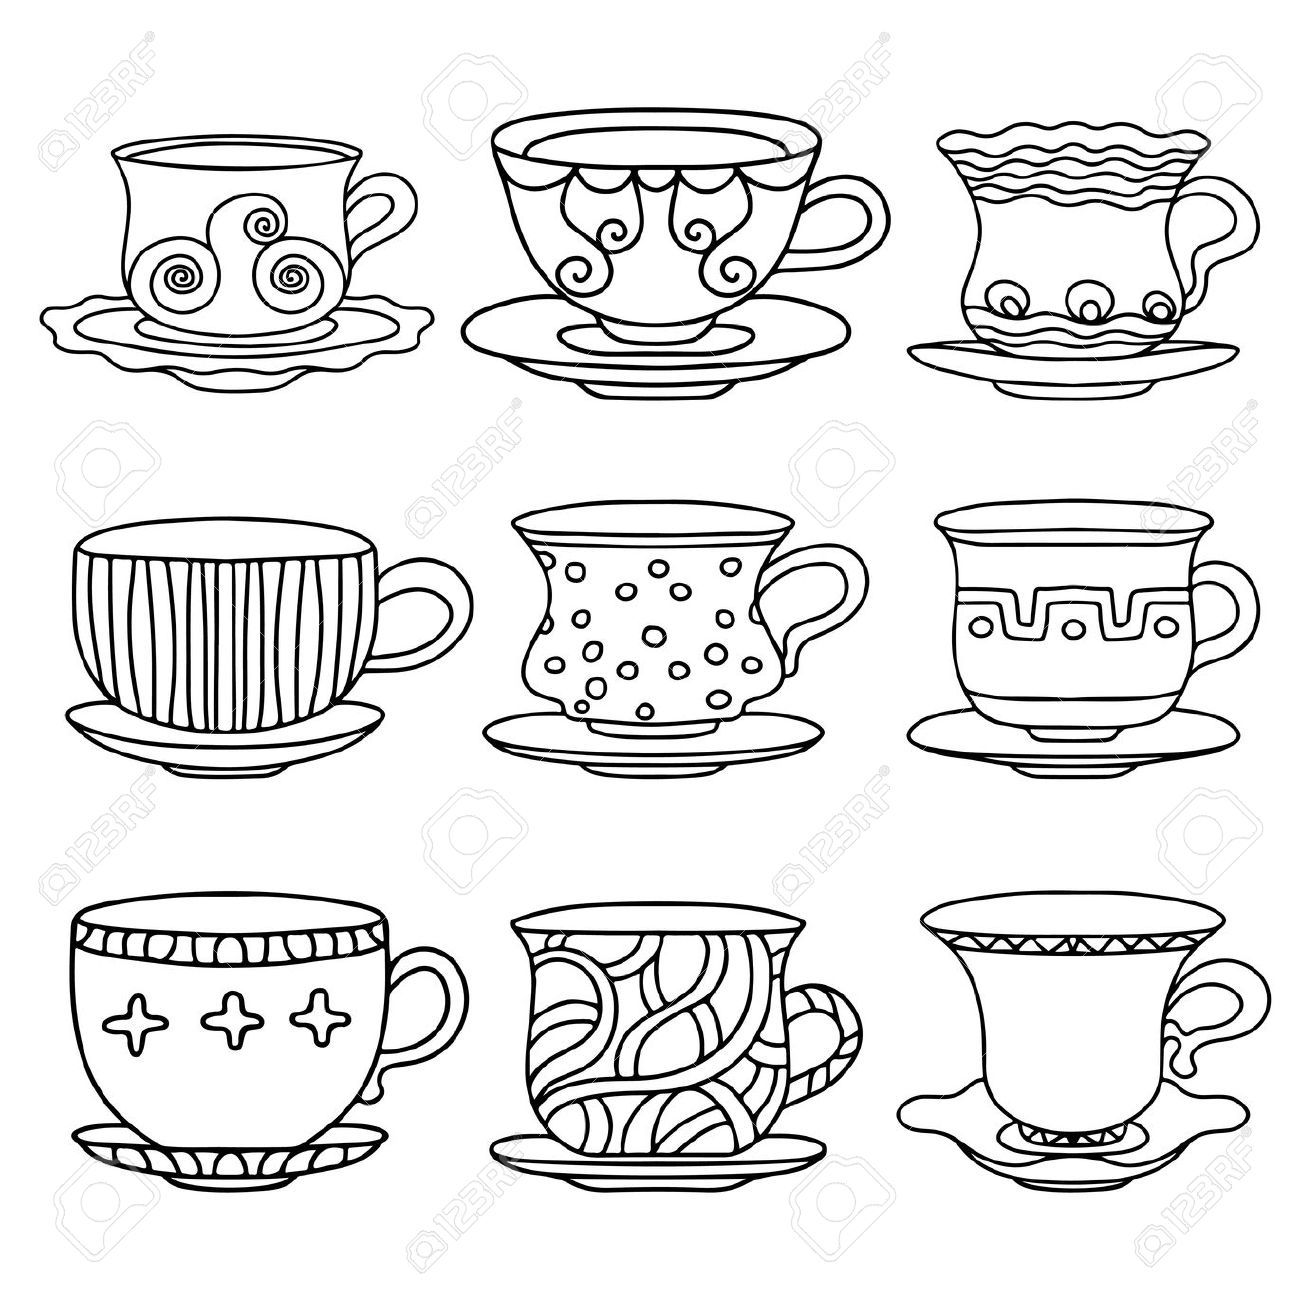 Tea Cup Cartoon images